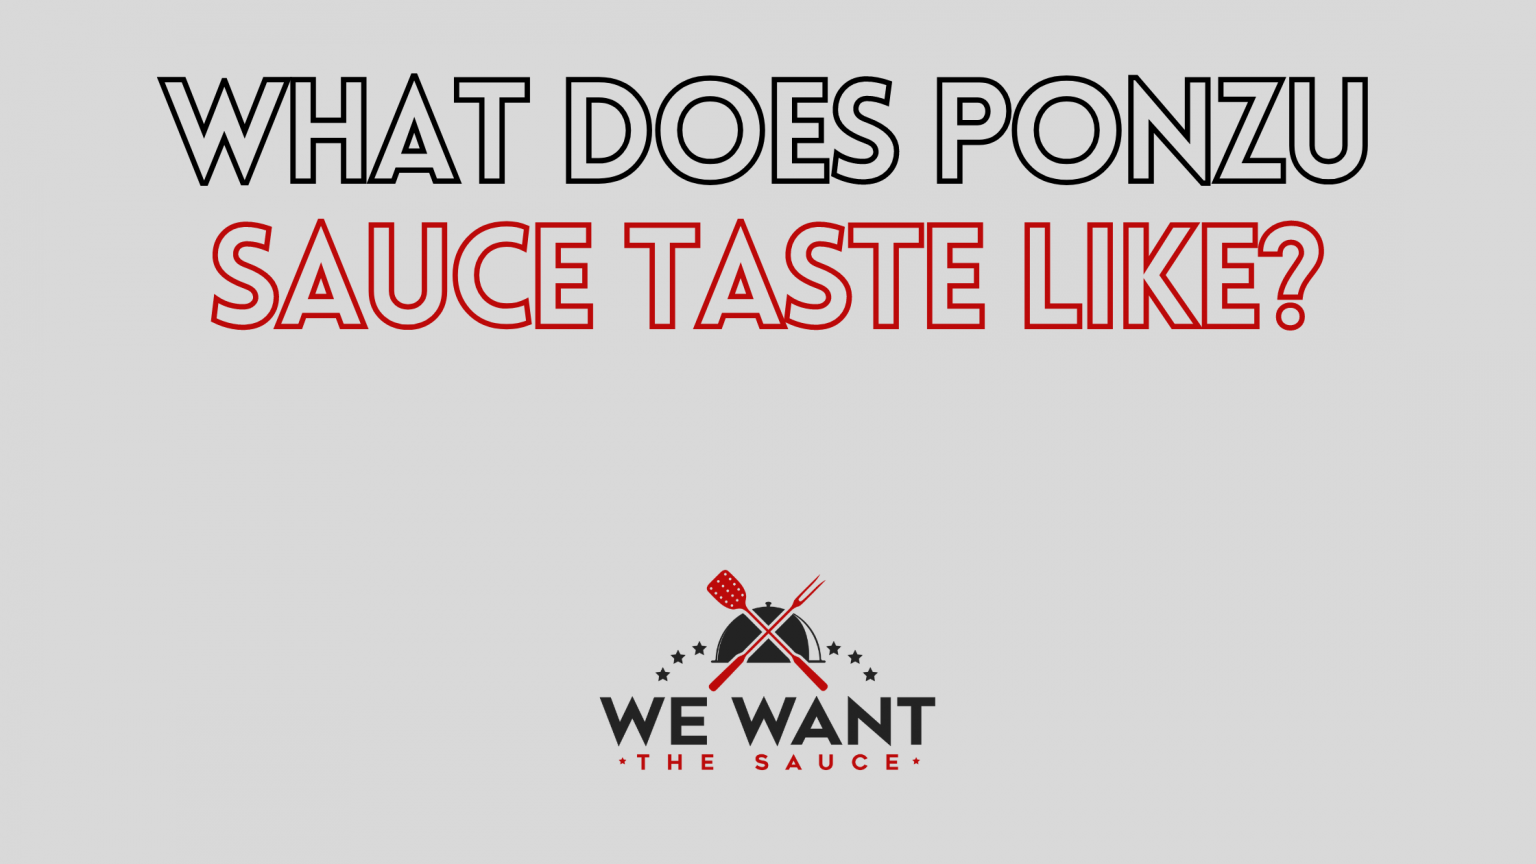 What Does Ponzu Sauce Taste Like?